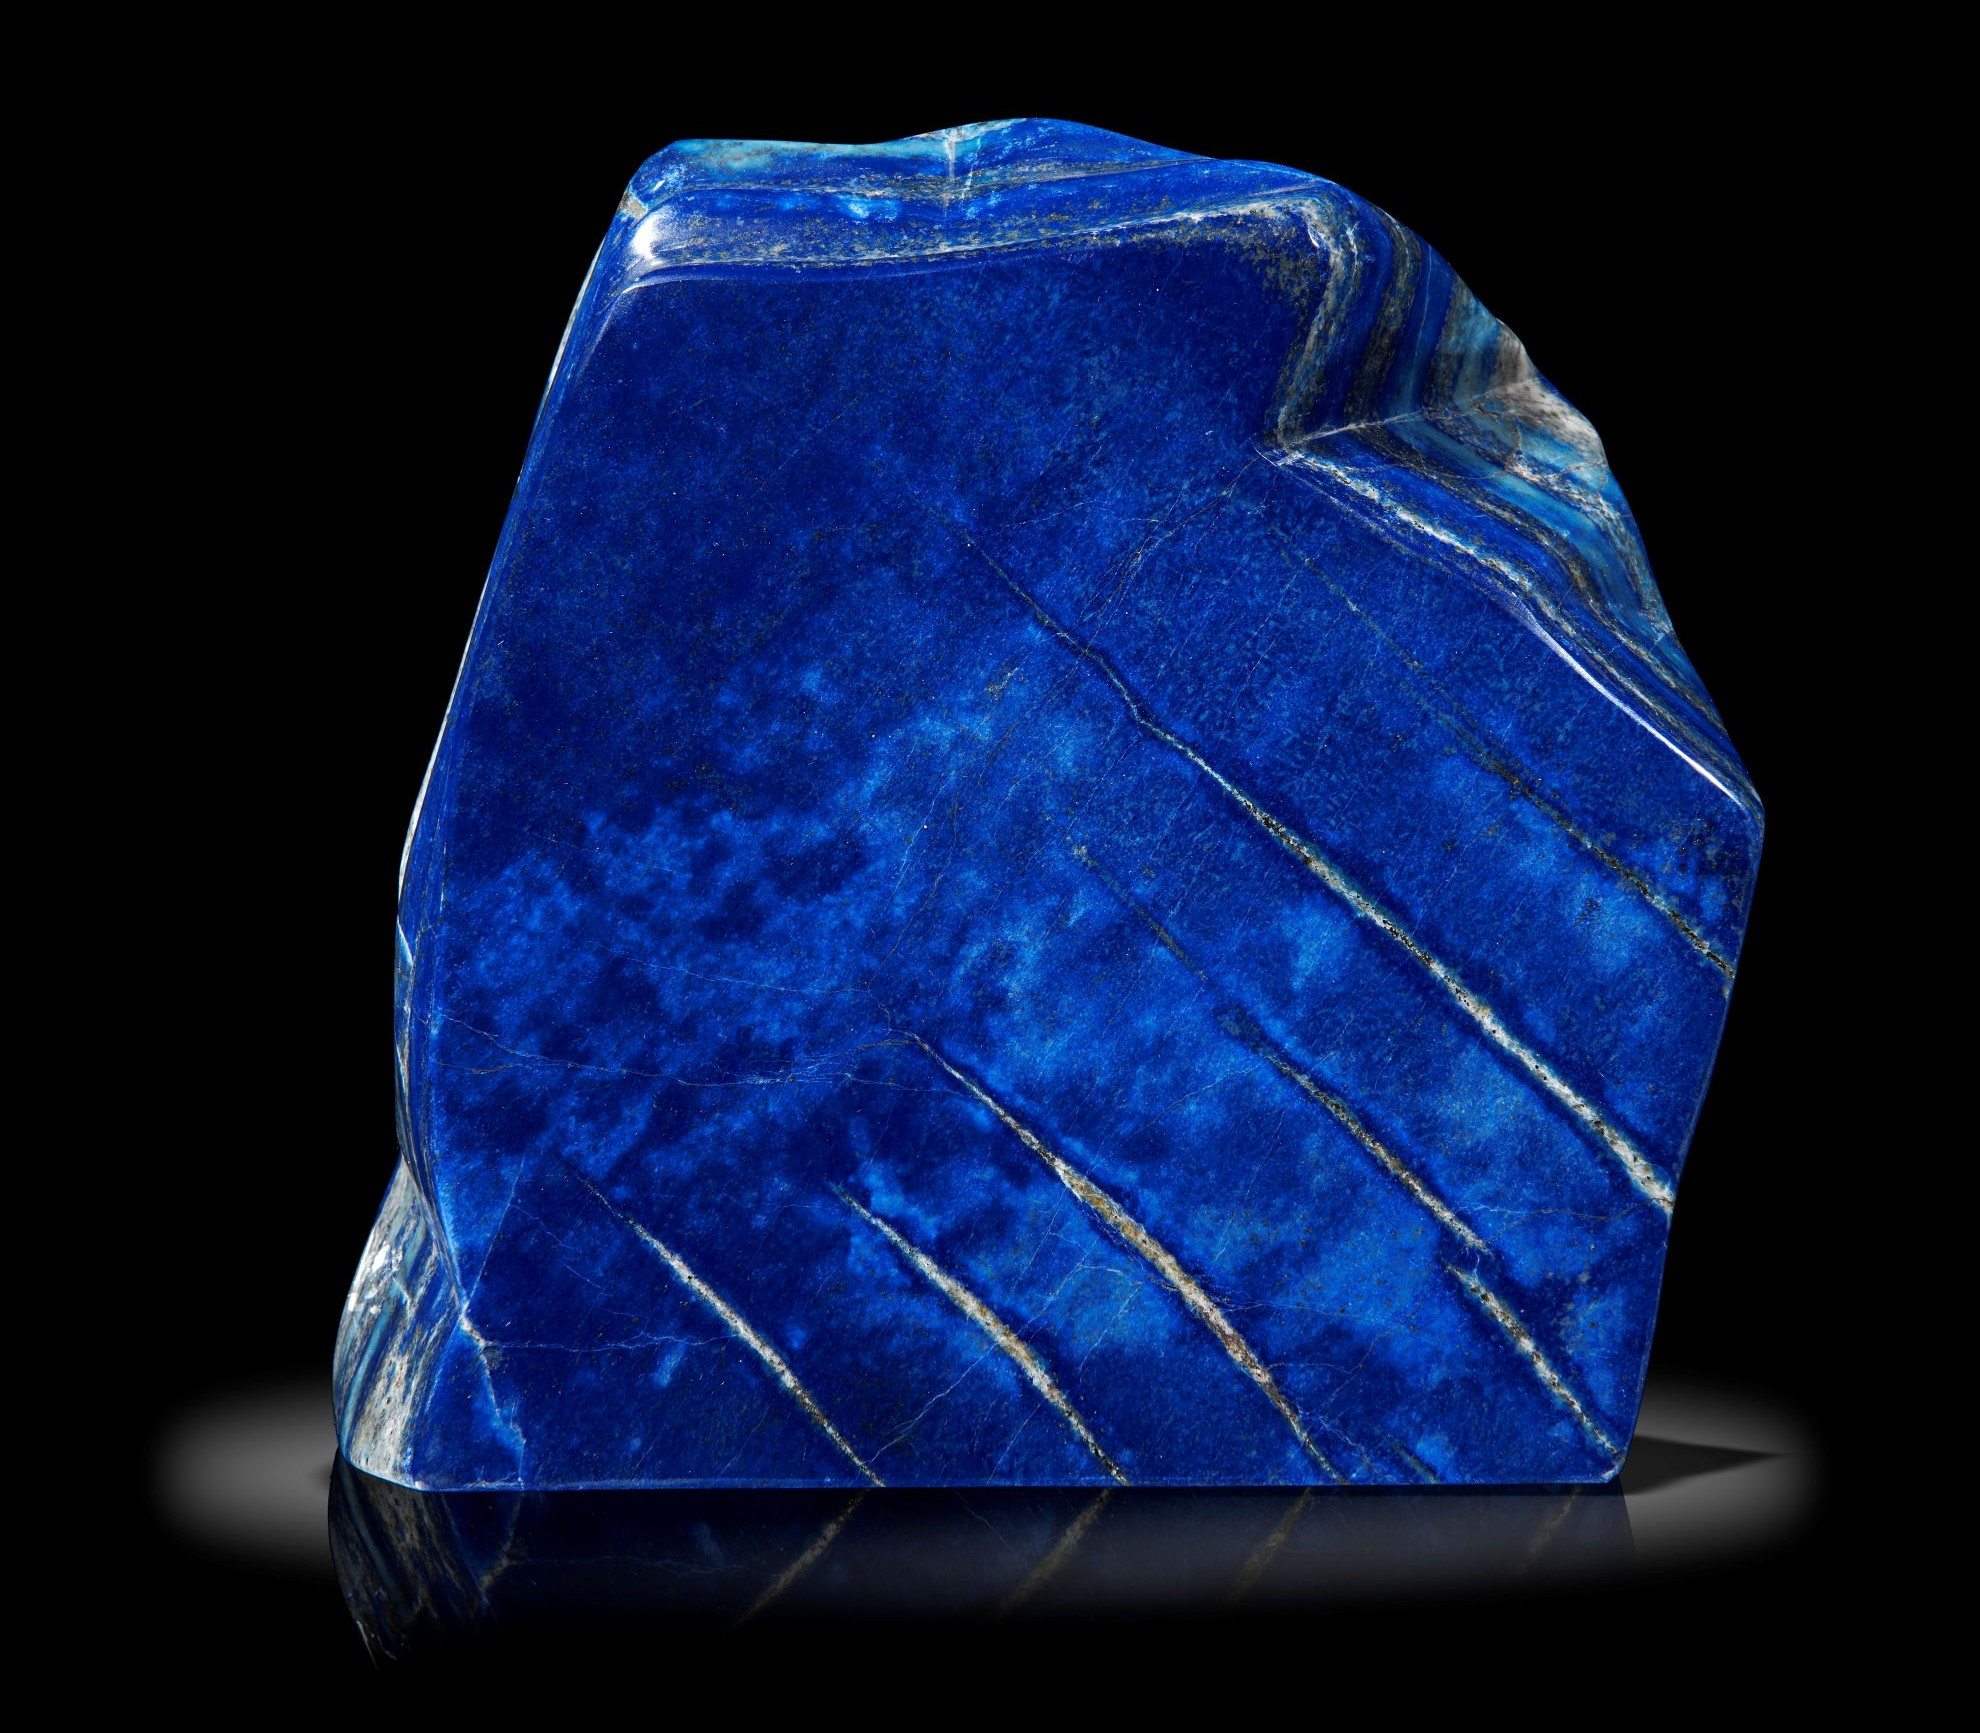 Lot 23 - Interior Design/Minerals: A Lapis lazuli freeform, 19cm high by 18cm wide by 6cm deep, 4.5kg